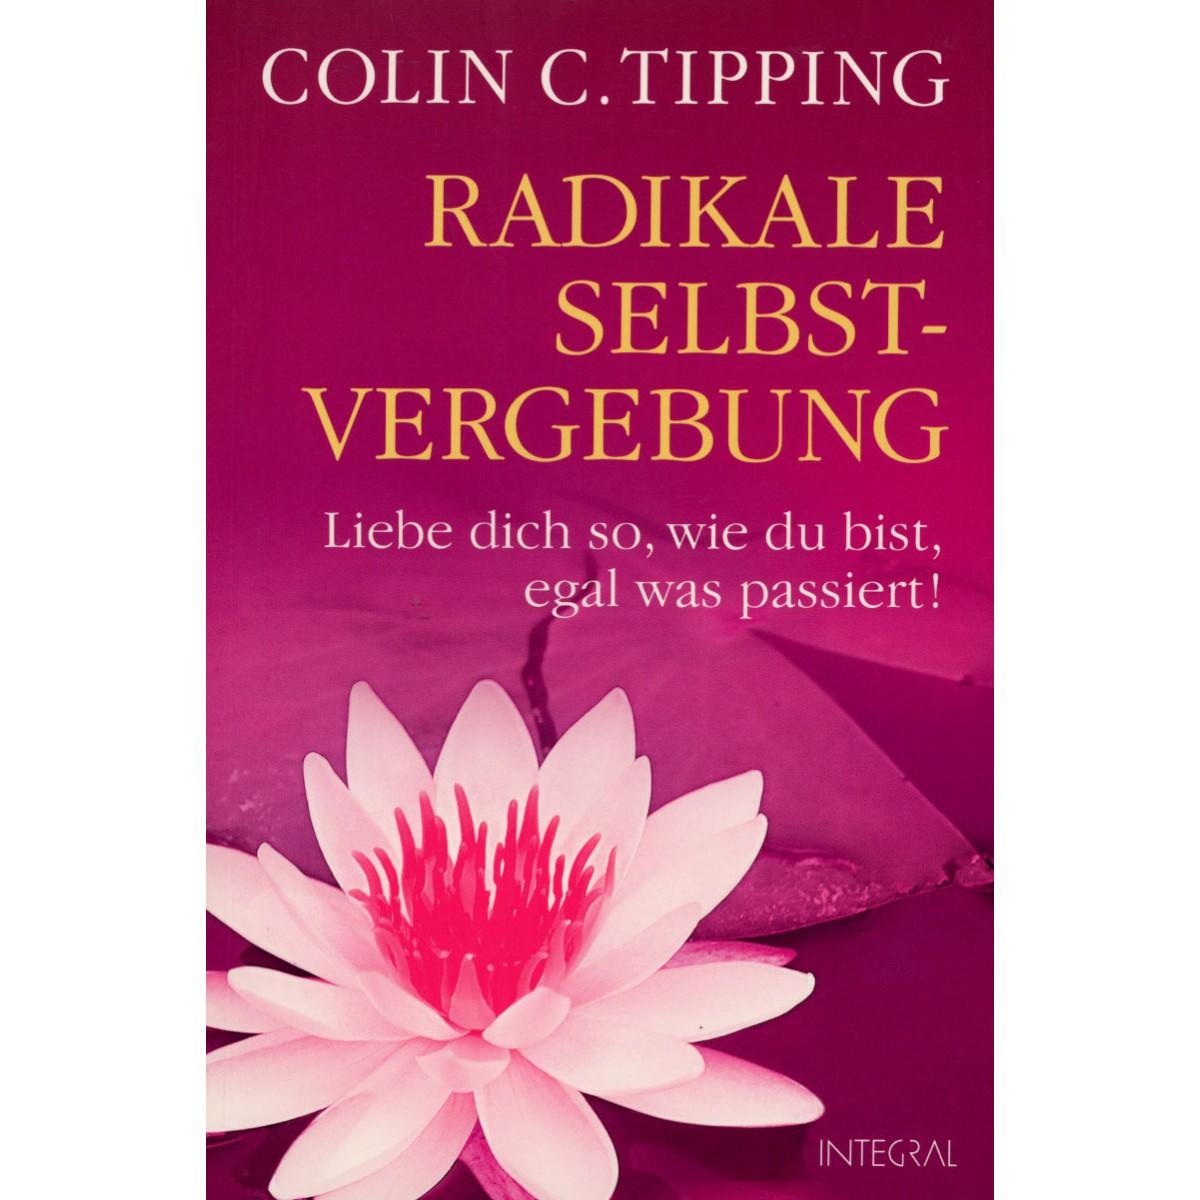 Tipping Colin C., Radikale Selbstvergebung